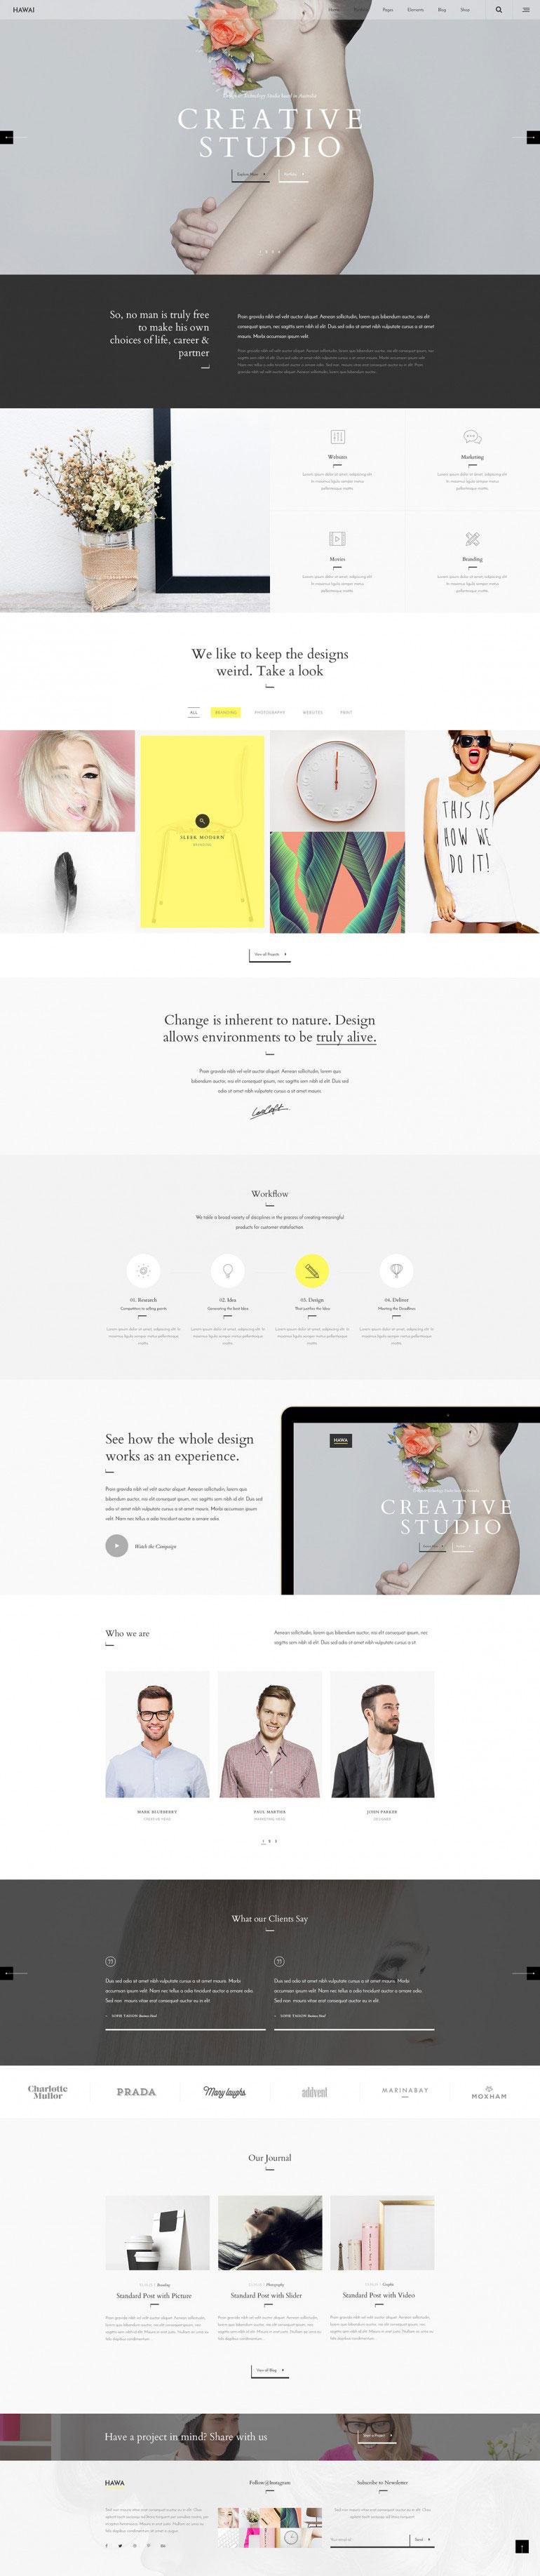 Creative_Website_Design_Inspiration_2016_013